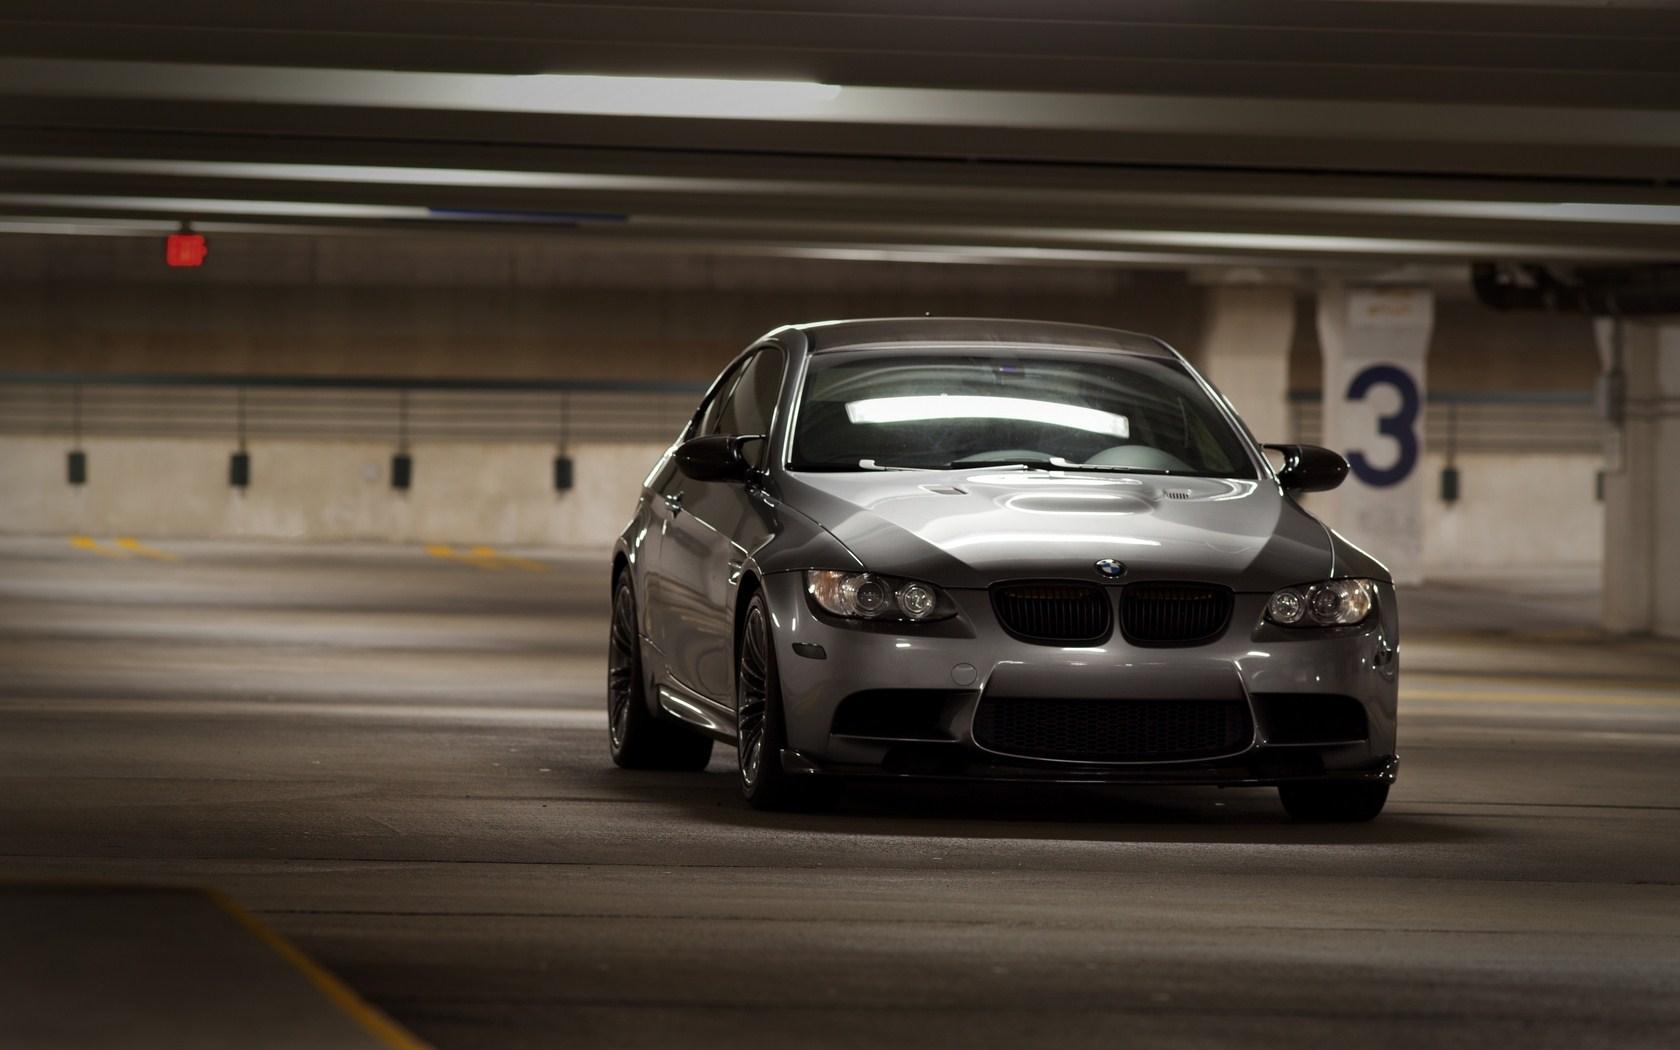 Gray BMW Garage Awesome HD Wallpaper